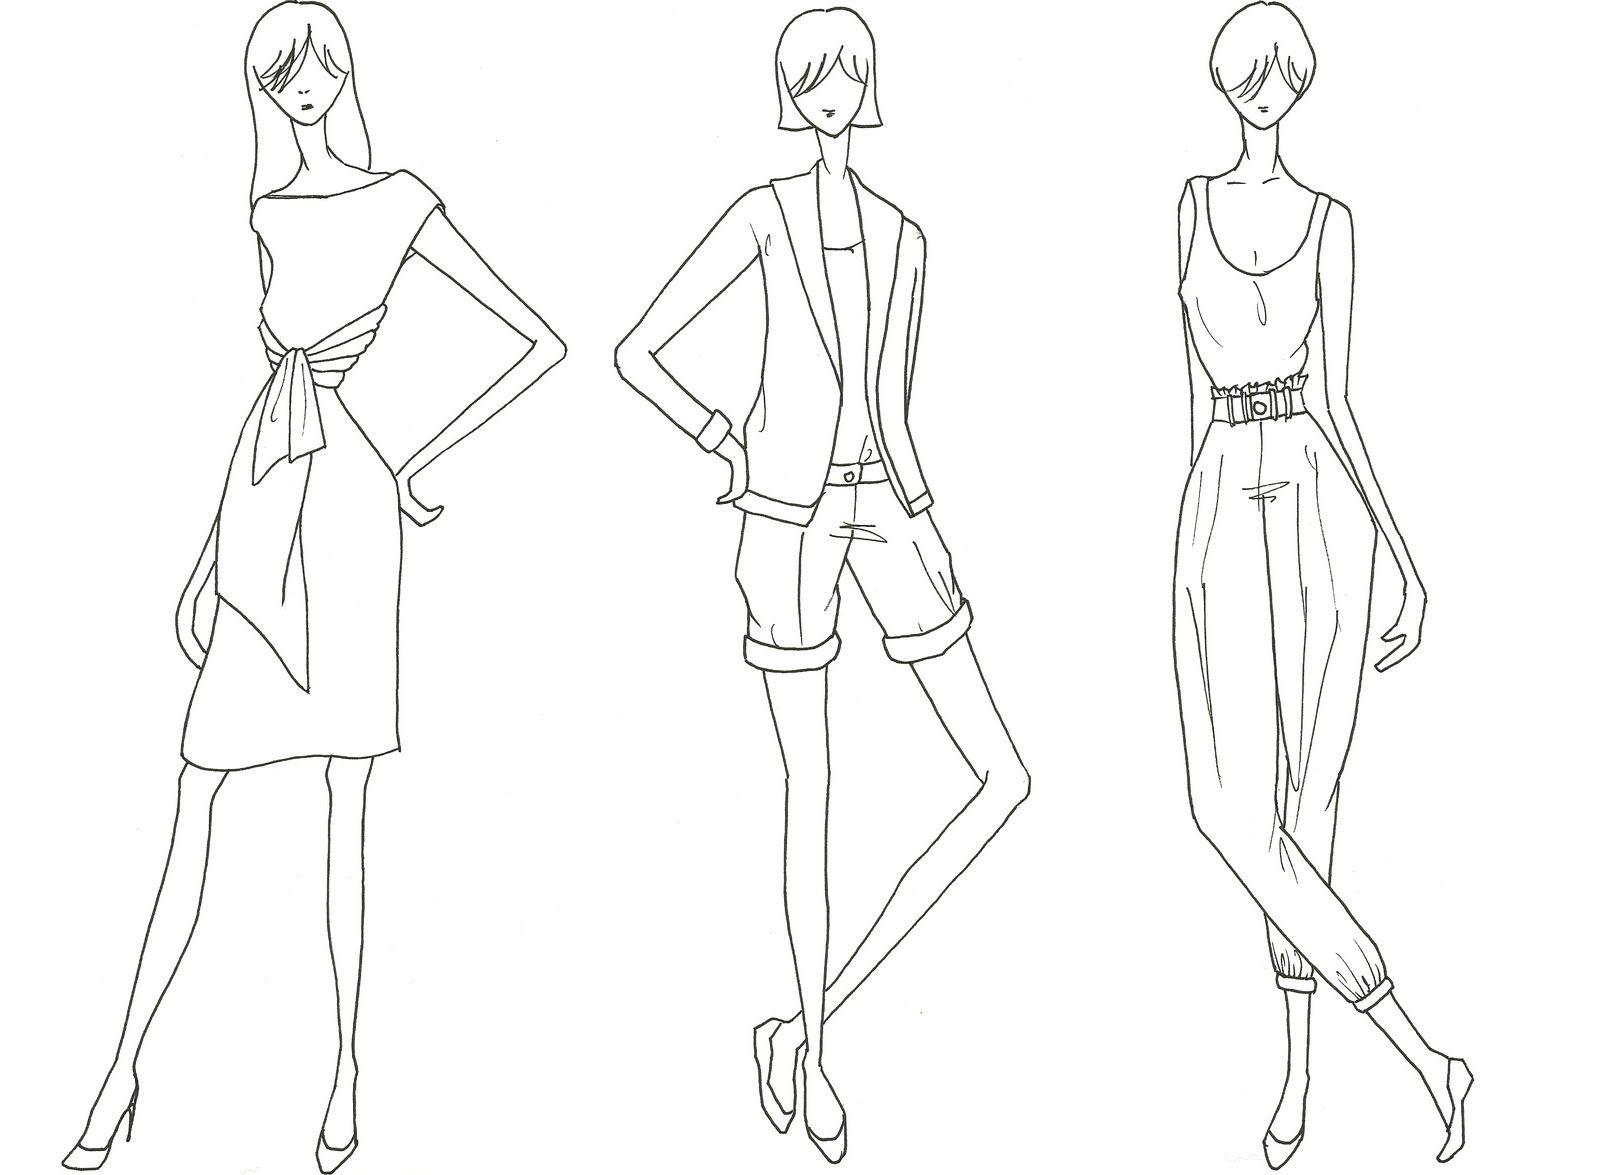 mutinee: Fashion Figure Drawing of mine | Learning drawing ...